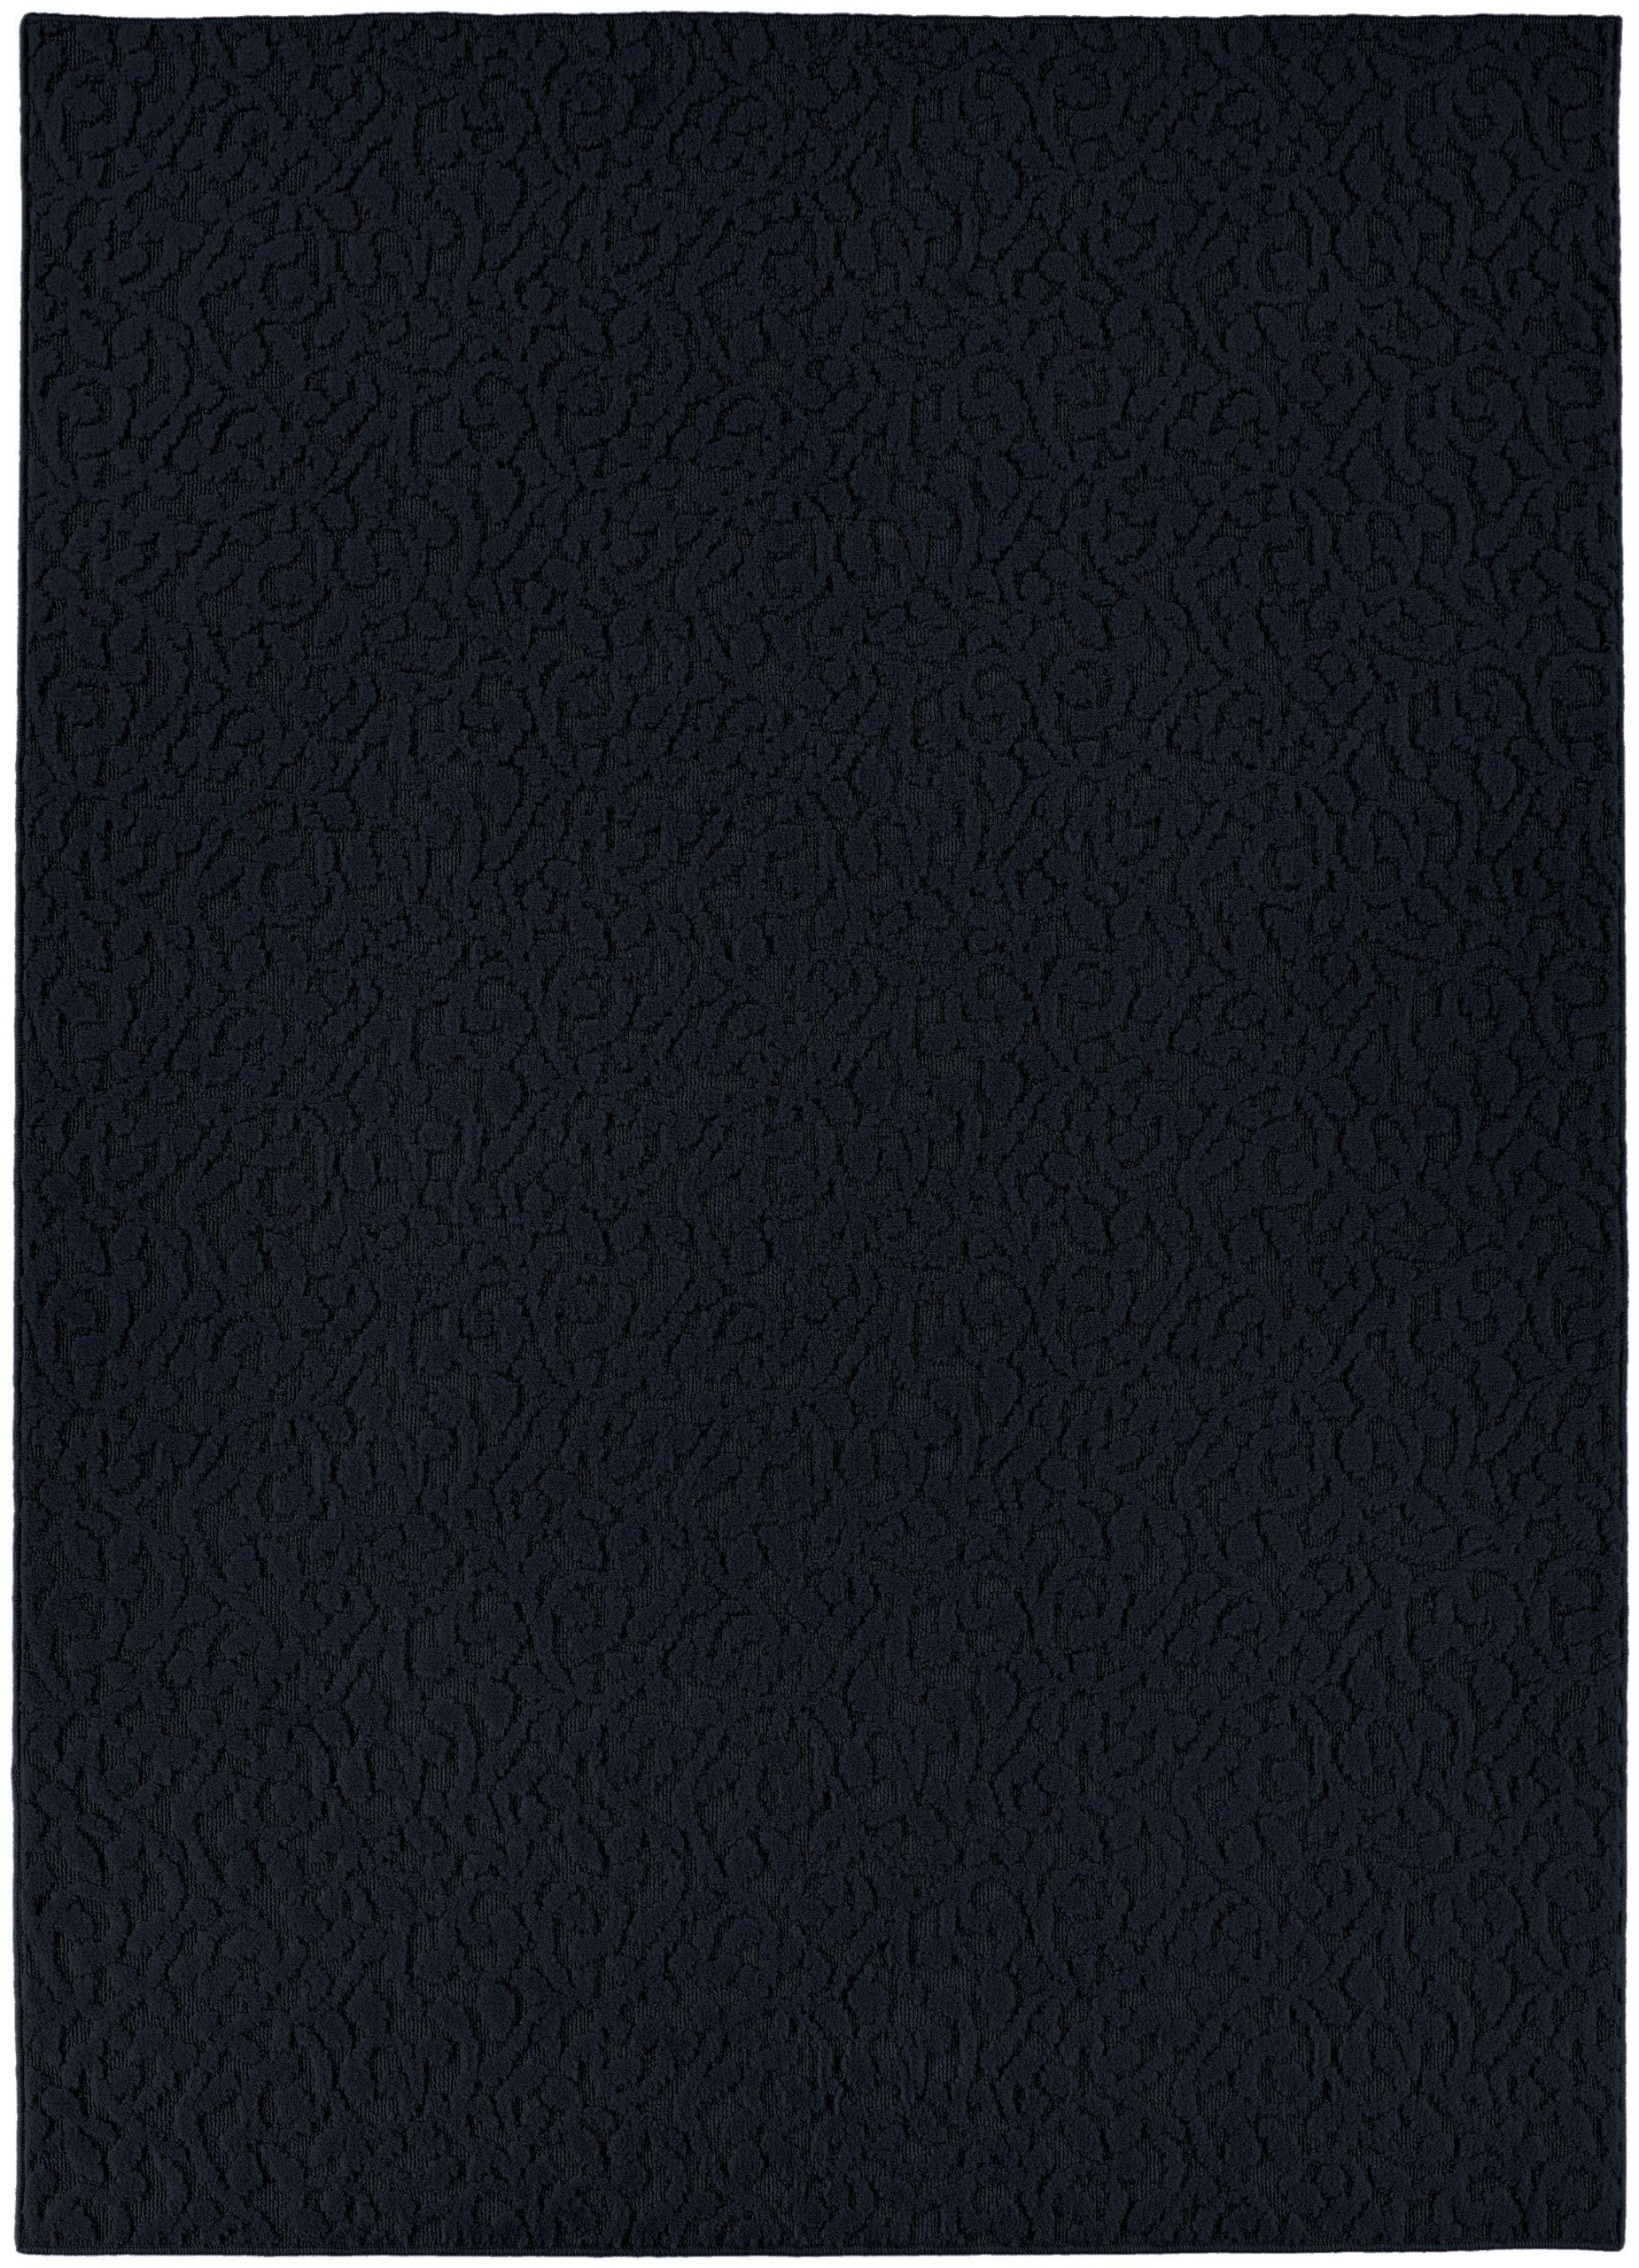 Garland Rug Ivy Area Rug, 6-Feet by 9-Feet, Navy